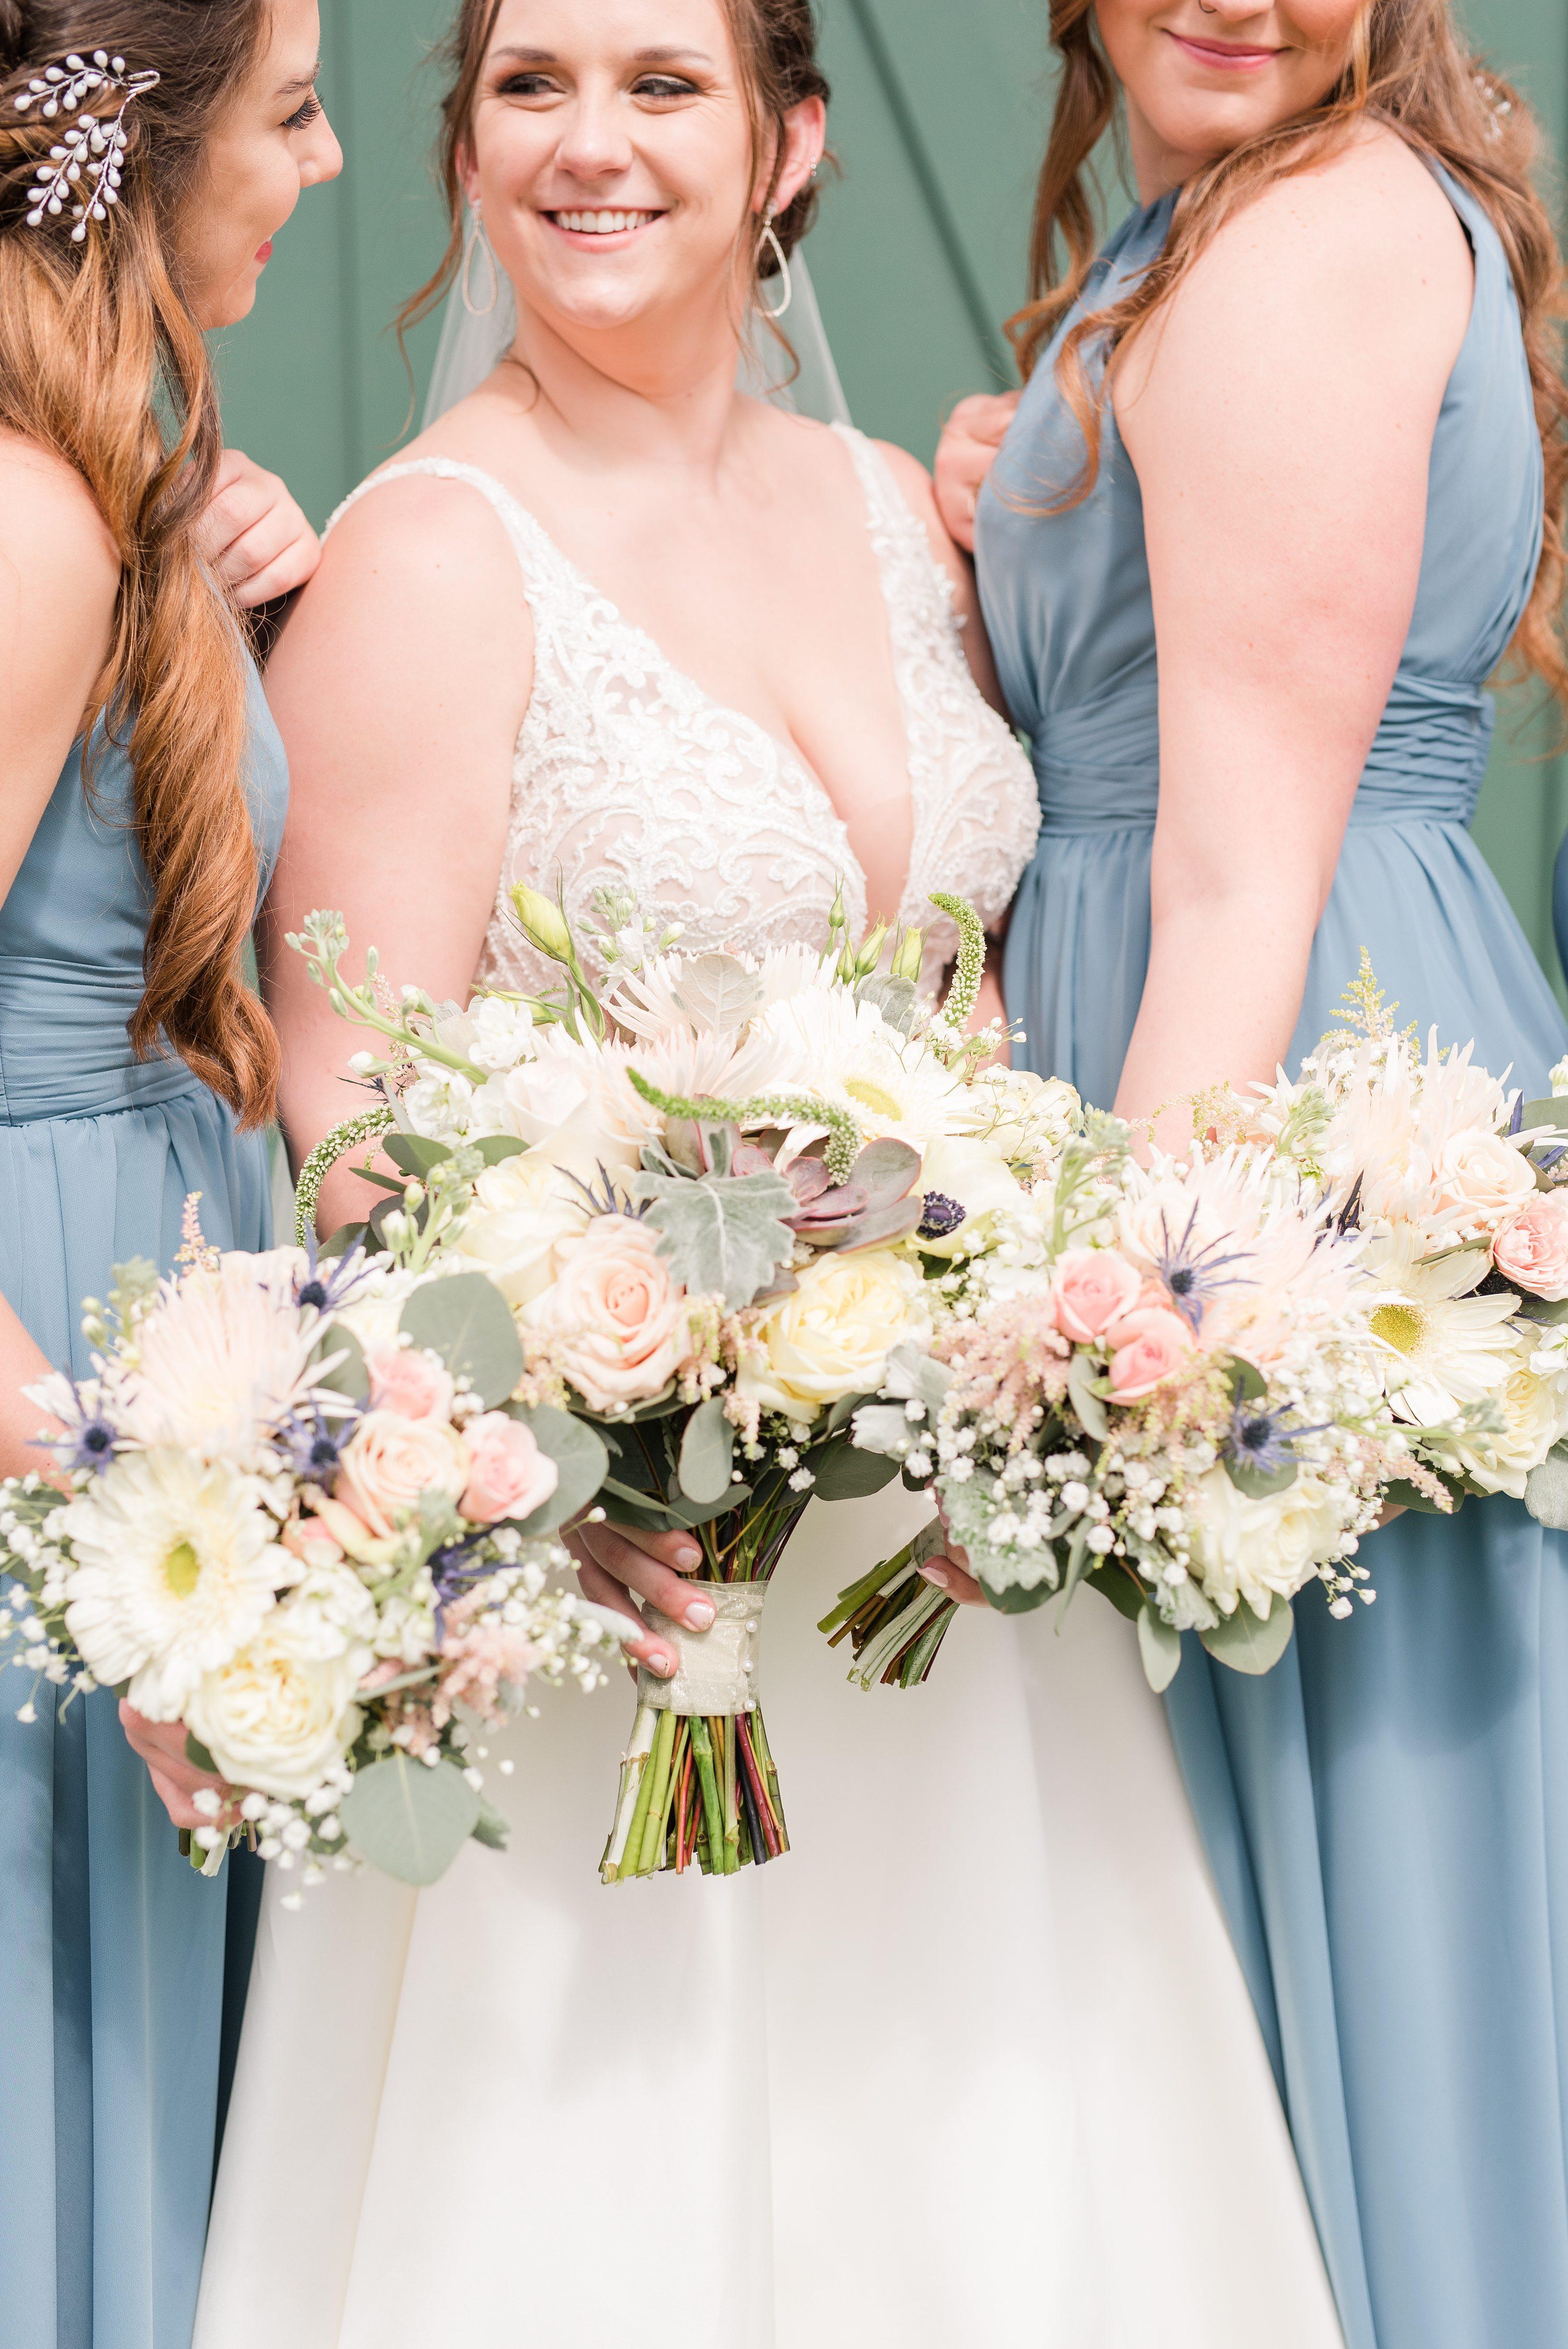 Blue Ridge Mountains Wedding,Barn at Edgewood,Barn at Edgewood,bride and bridesmaids,bridesmaids,bride,bridal bouquet,wedding flowers,floral bouquet